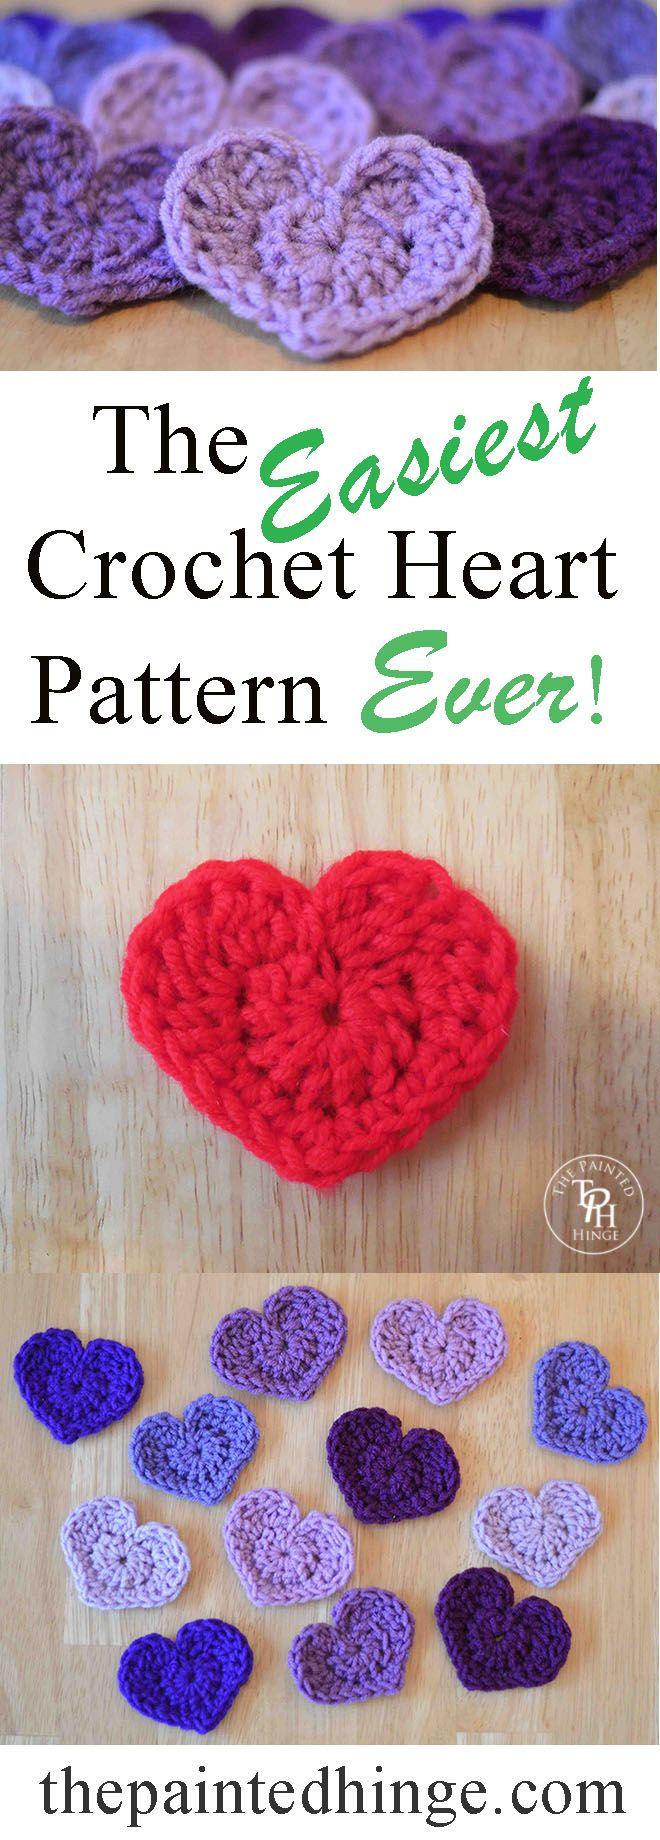 The easiest crochet heart pattern ever! Free pattern!